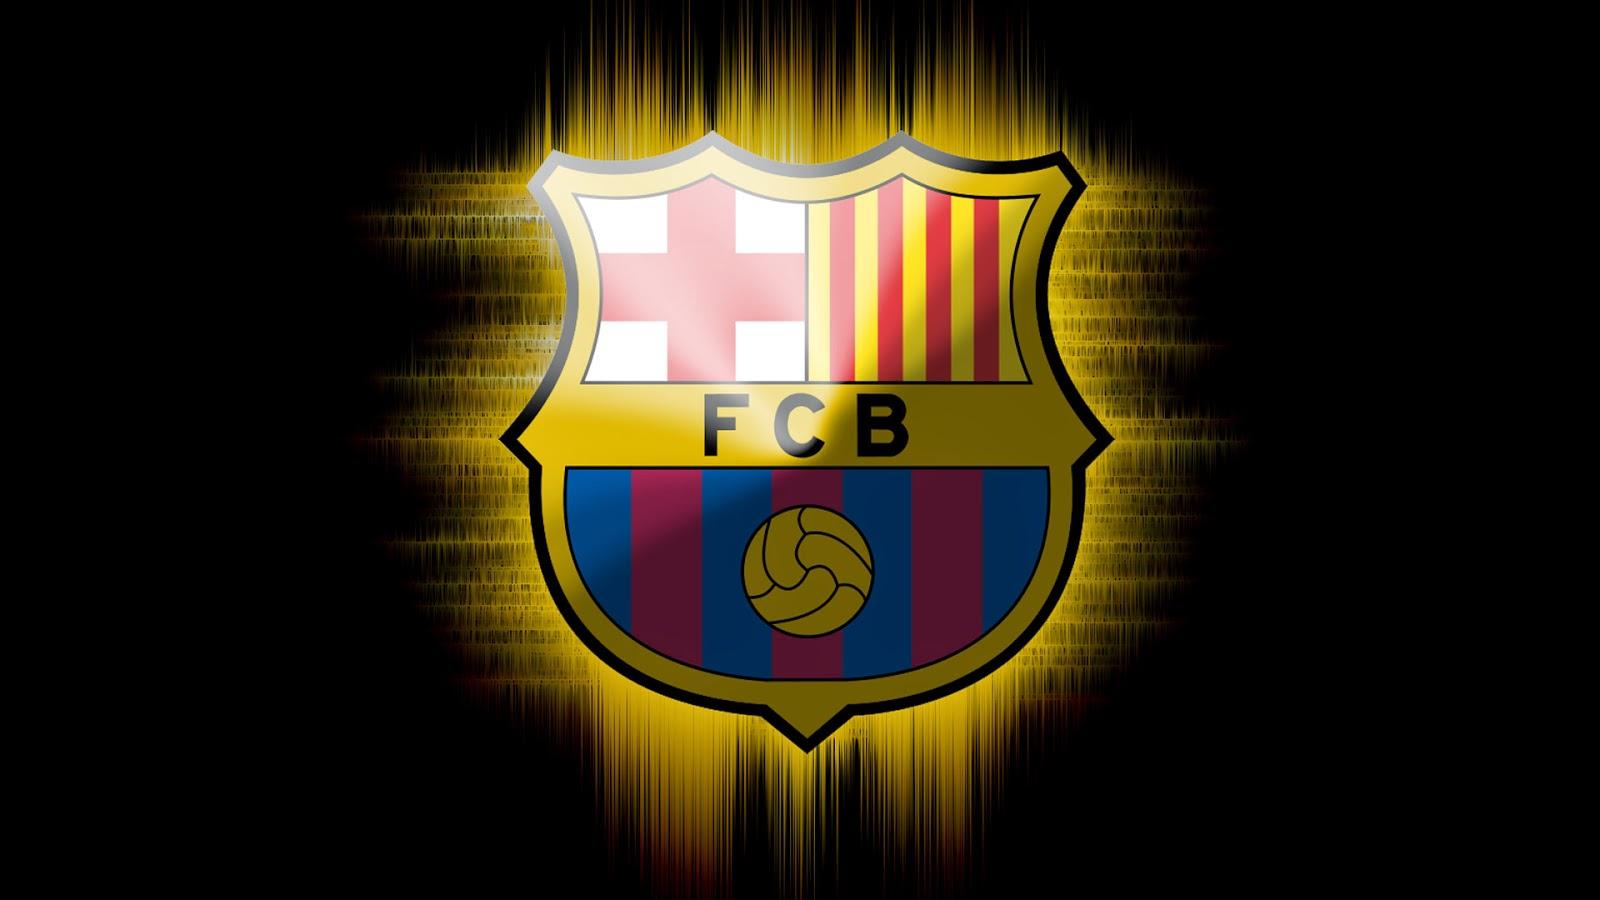 barcelona logo wallpaper 2014 hd wallpaper area hd